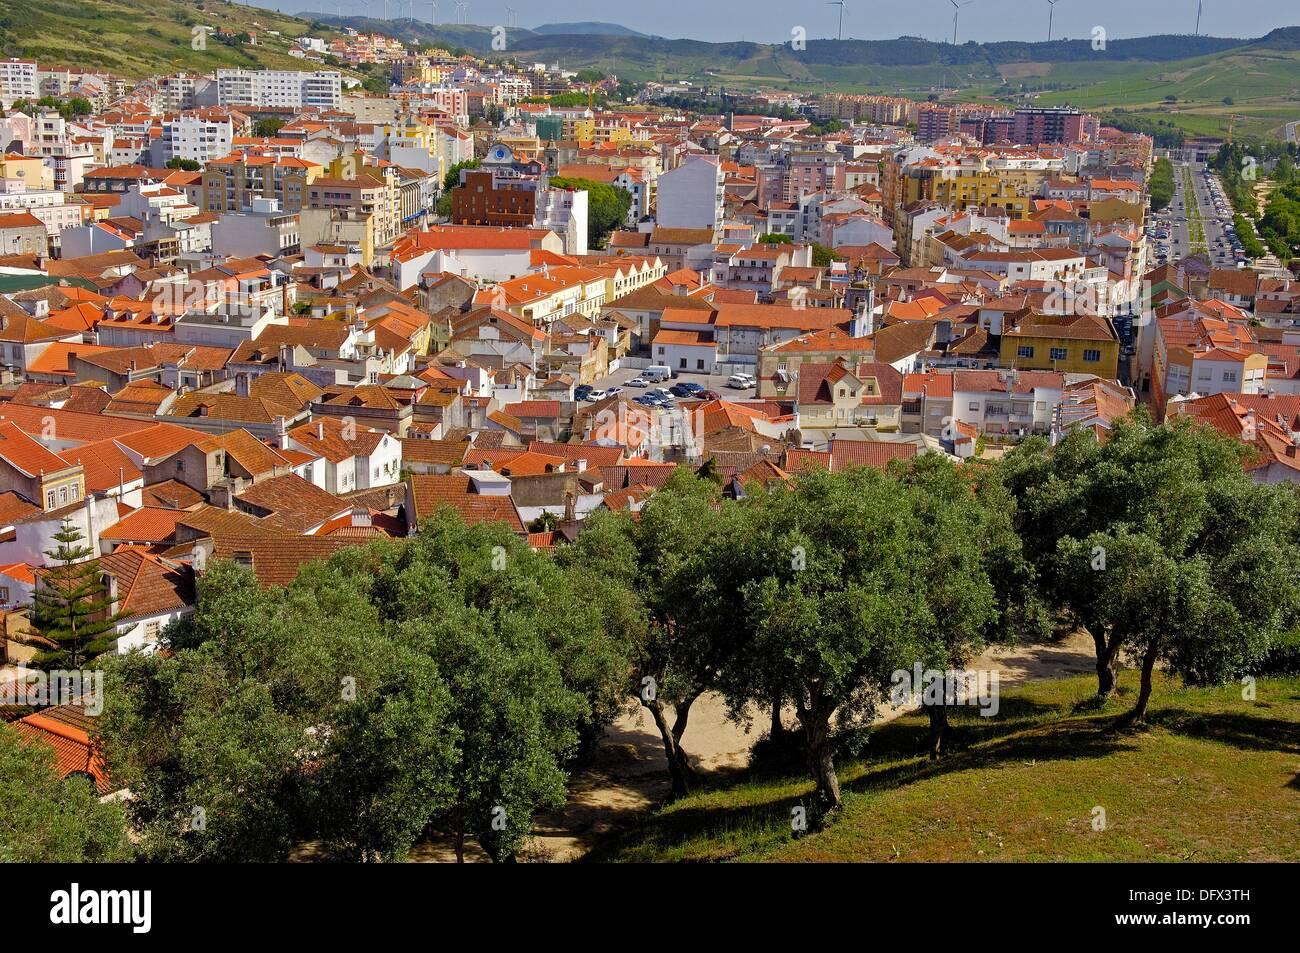 Torres Vedras, Lisbon district, Estremadura, Portugal. - Stock Image